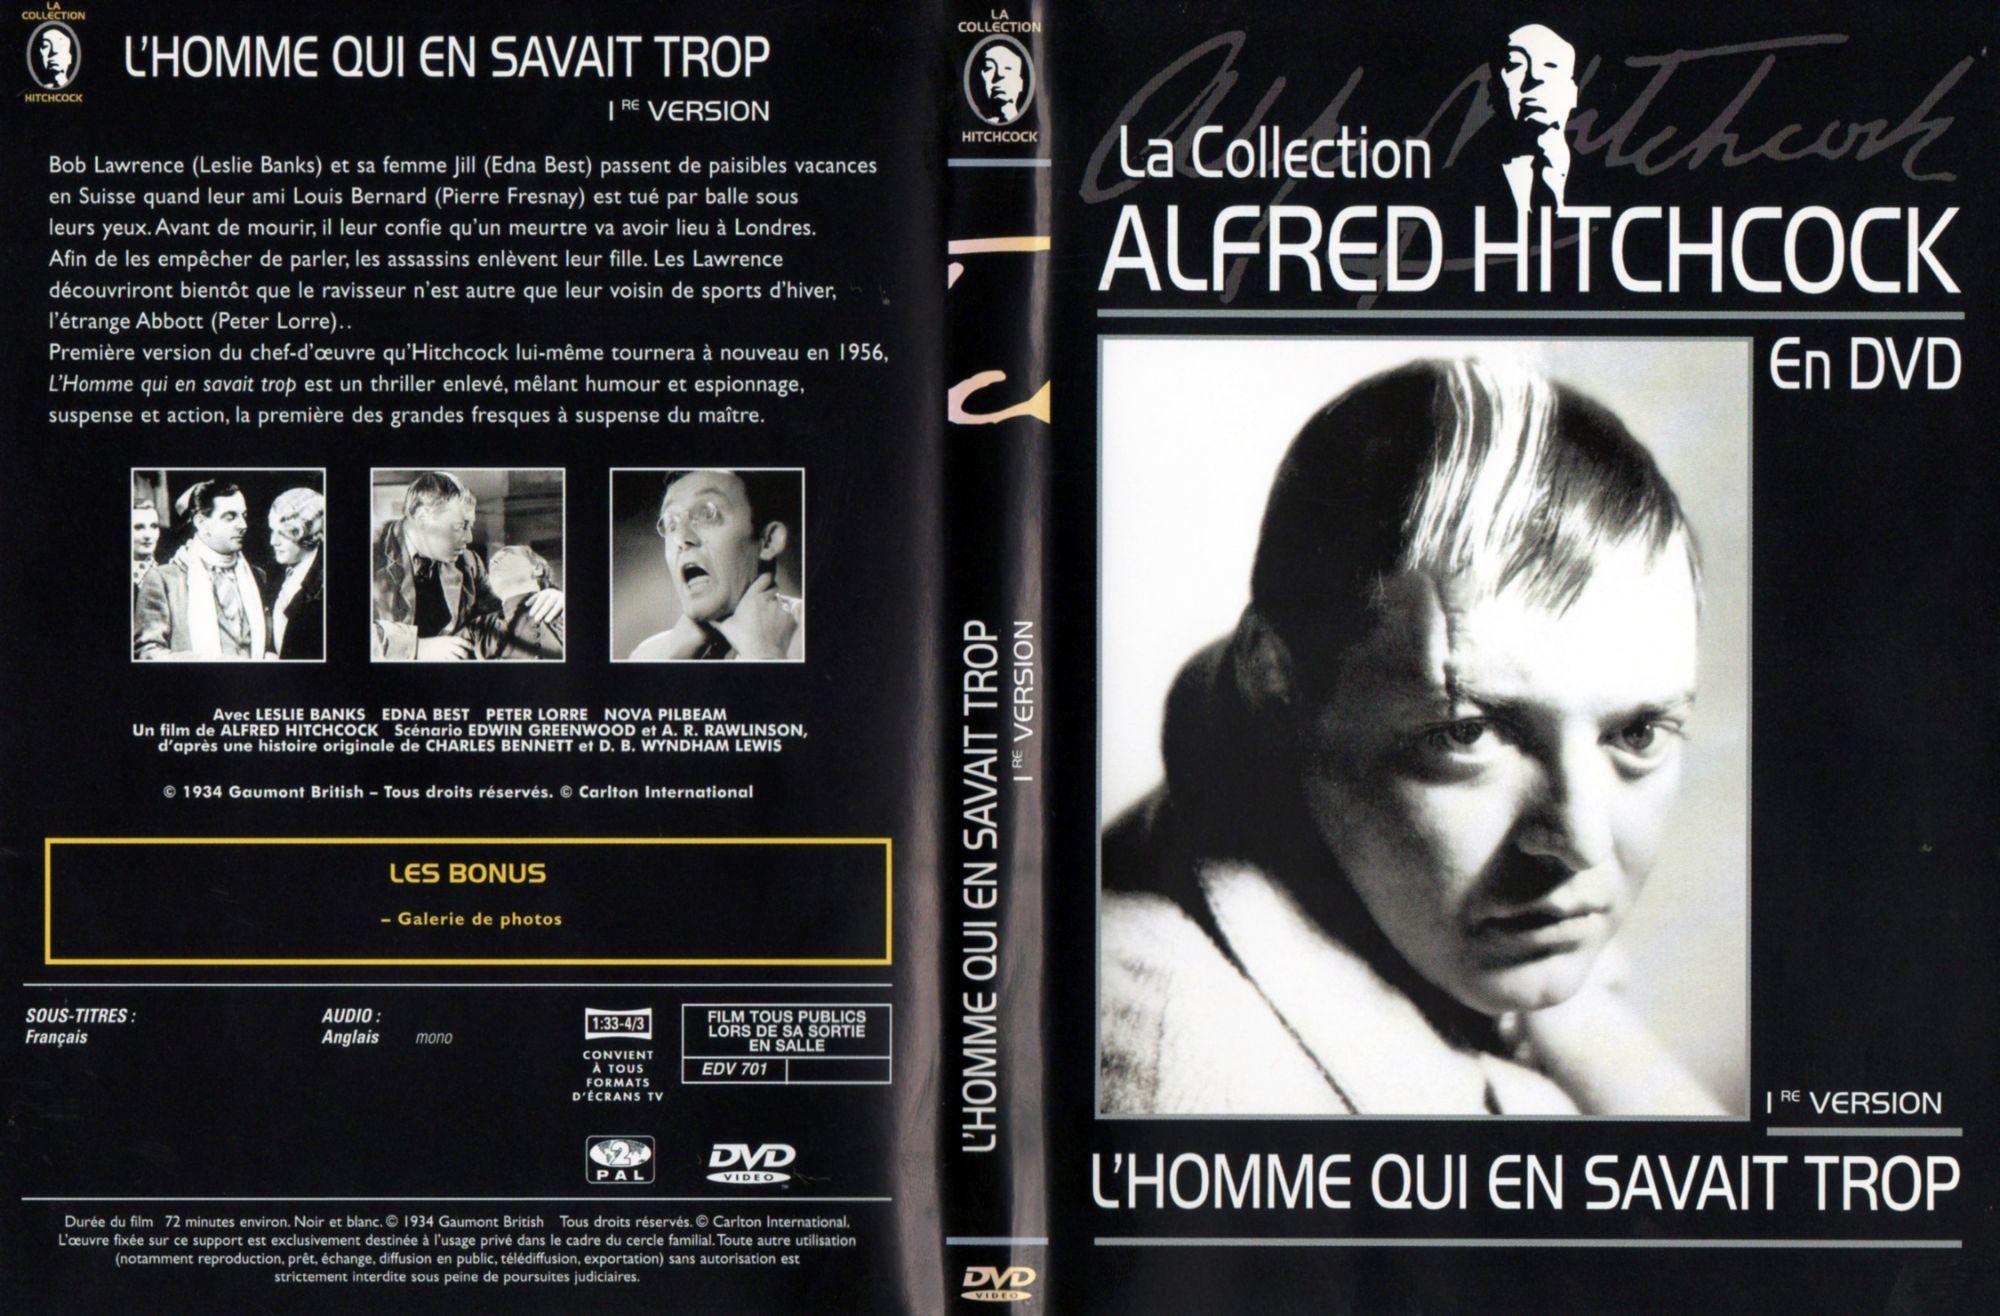 The Man Who Knew Too Much aka L'Homme qui en savait trop (1934, dir. Alfred Hitchcock) French Carlton-Journaux.fr magazine DVD